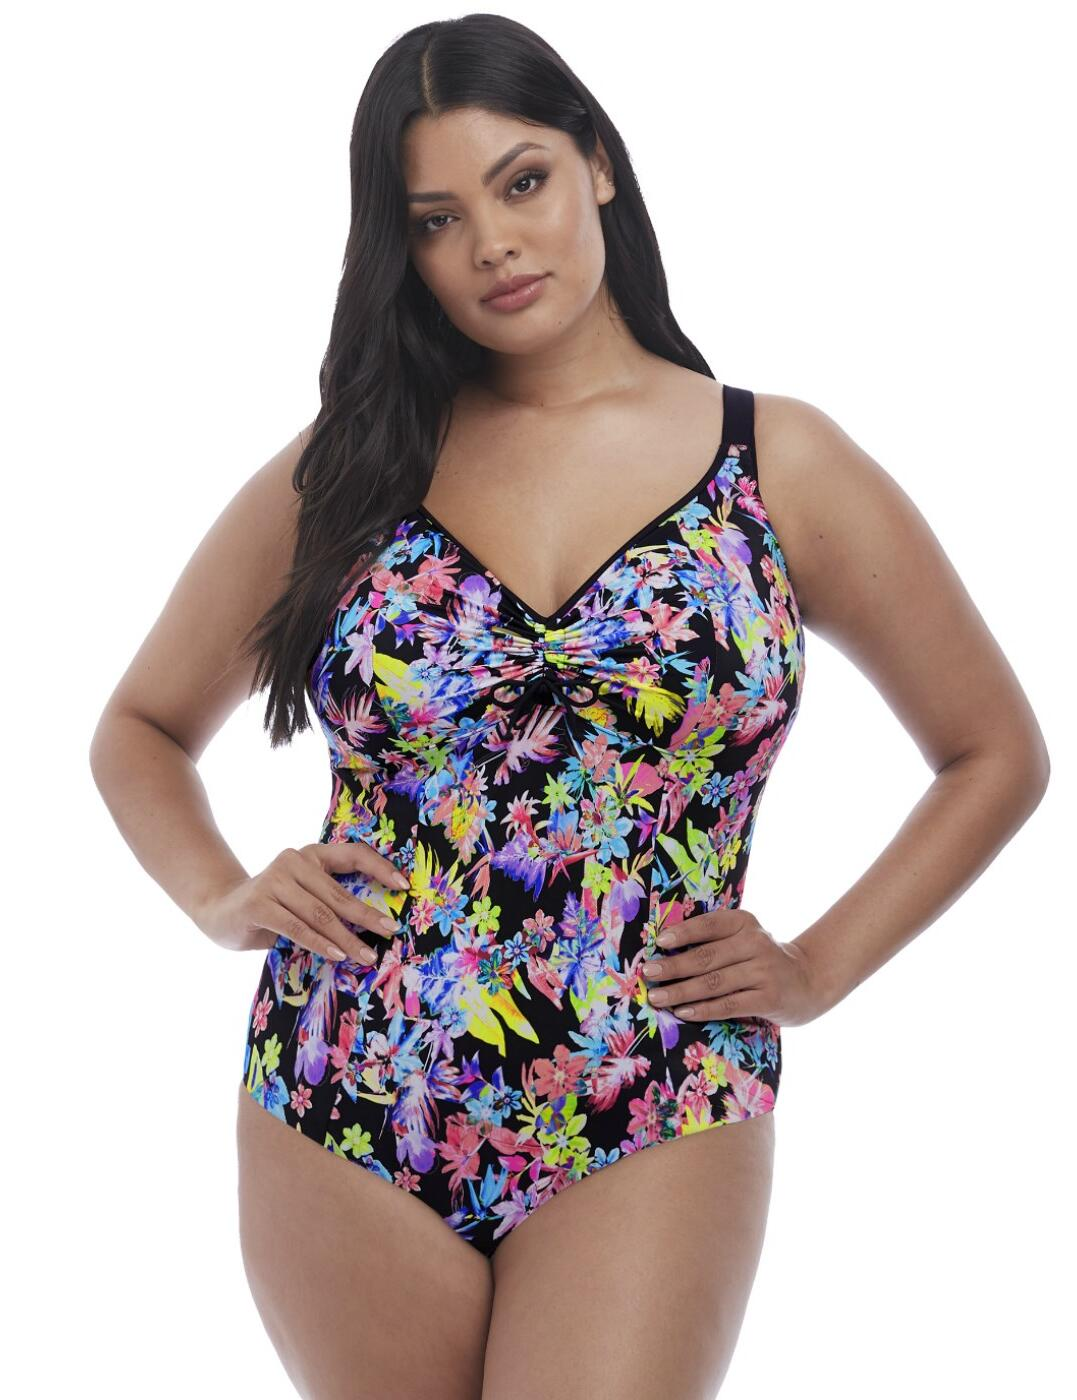 7170 Elomi Electroflower Moulded Adjustable Swimsuit - 7170 Black